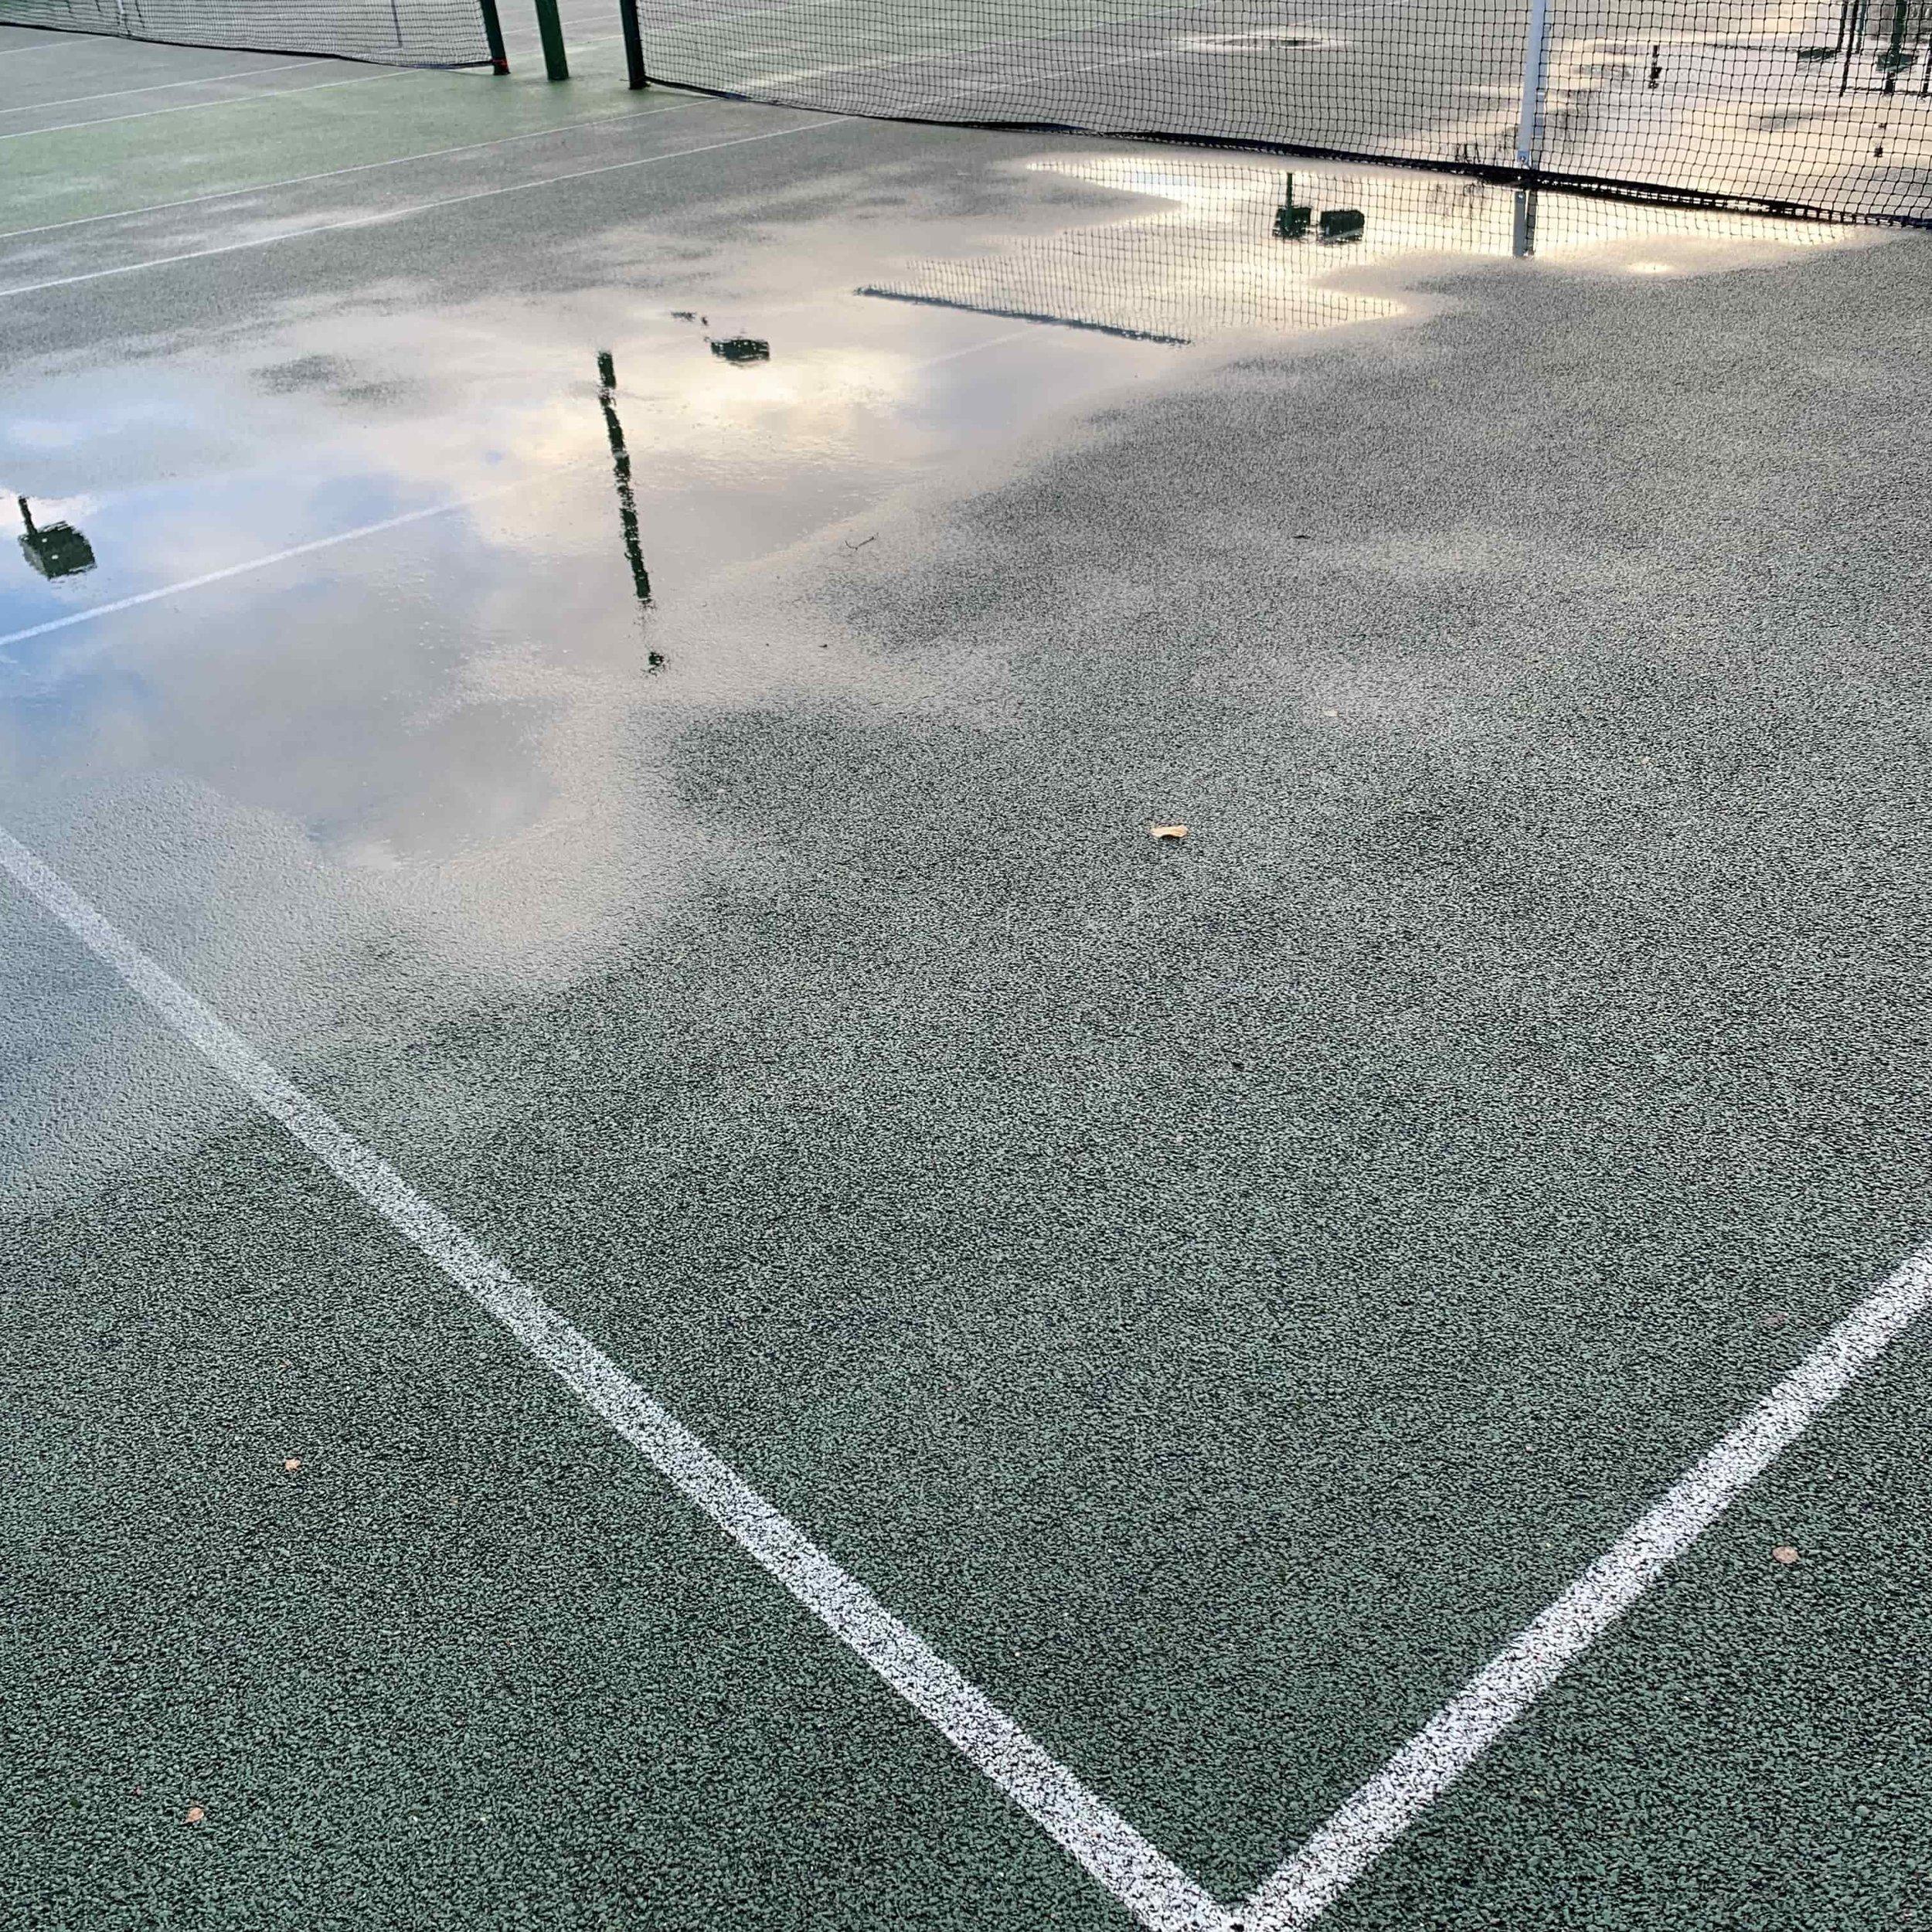 tennisBrothers_british_weather.JPG